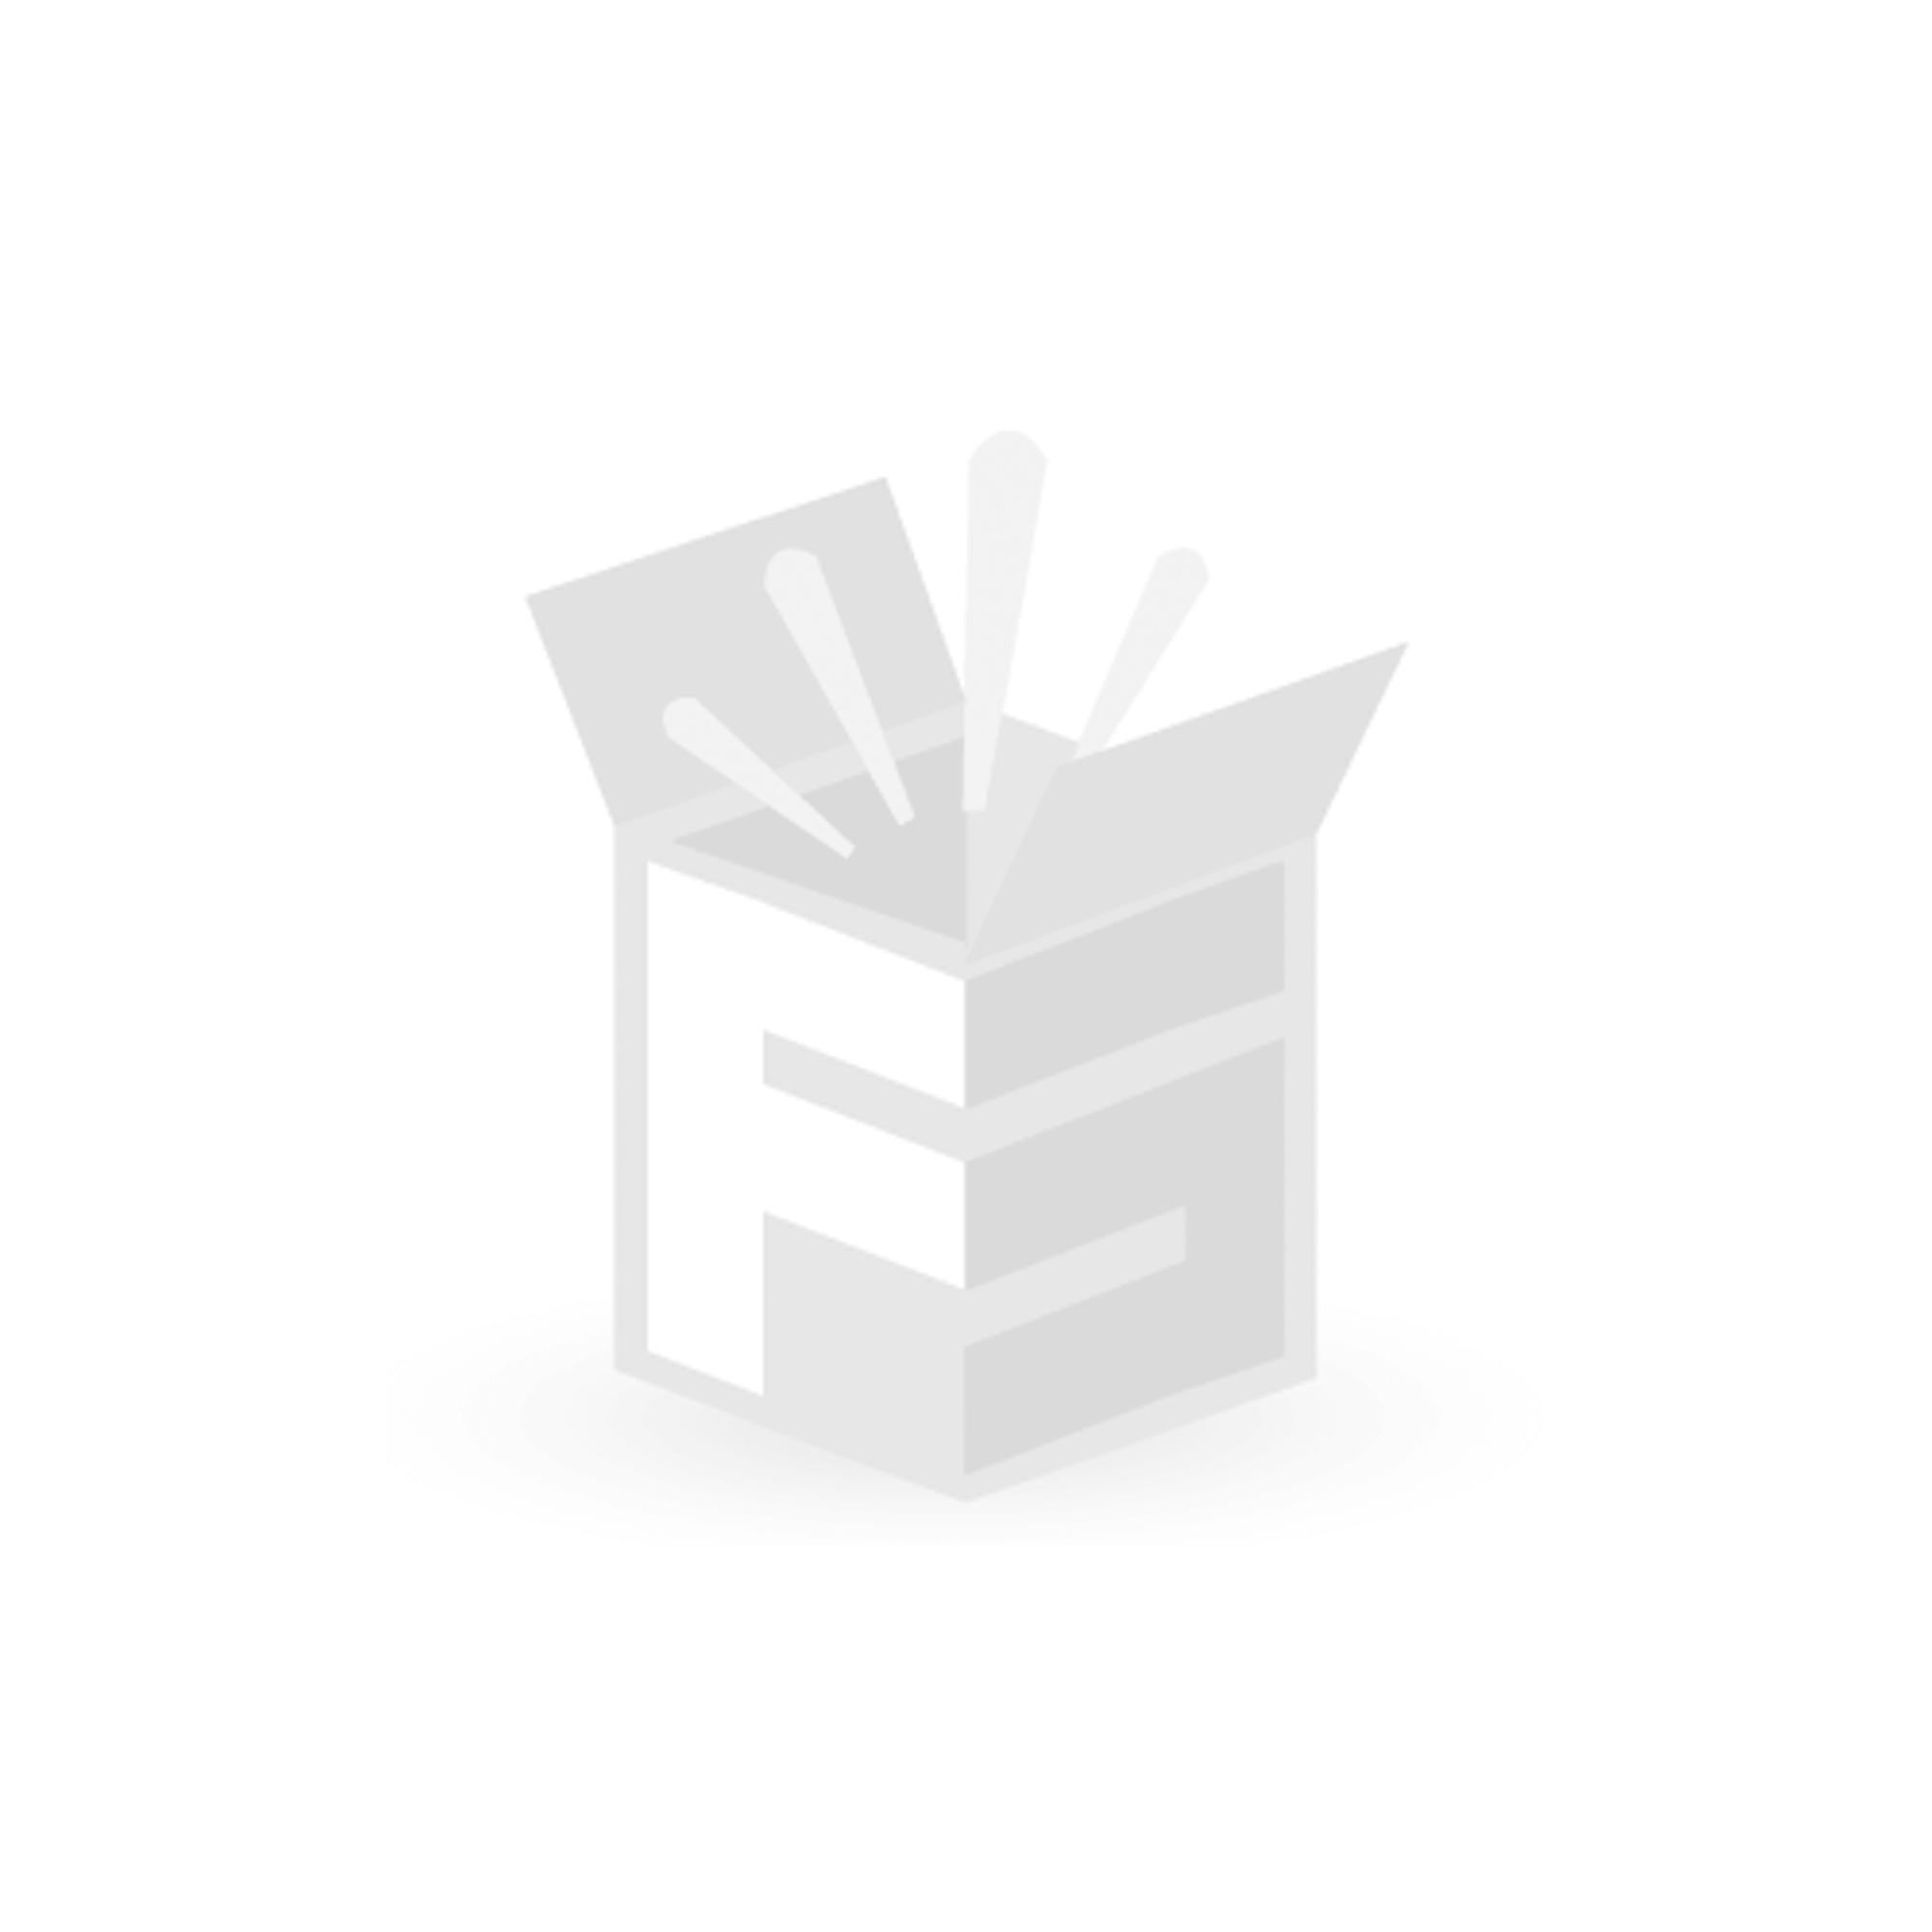 bosch schlagbohrmaschine gsb 13re zb aktionspaket. Black Bedroom Furniture Sets. Home Design Ideas